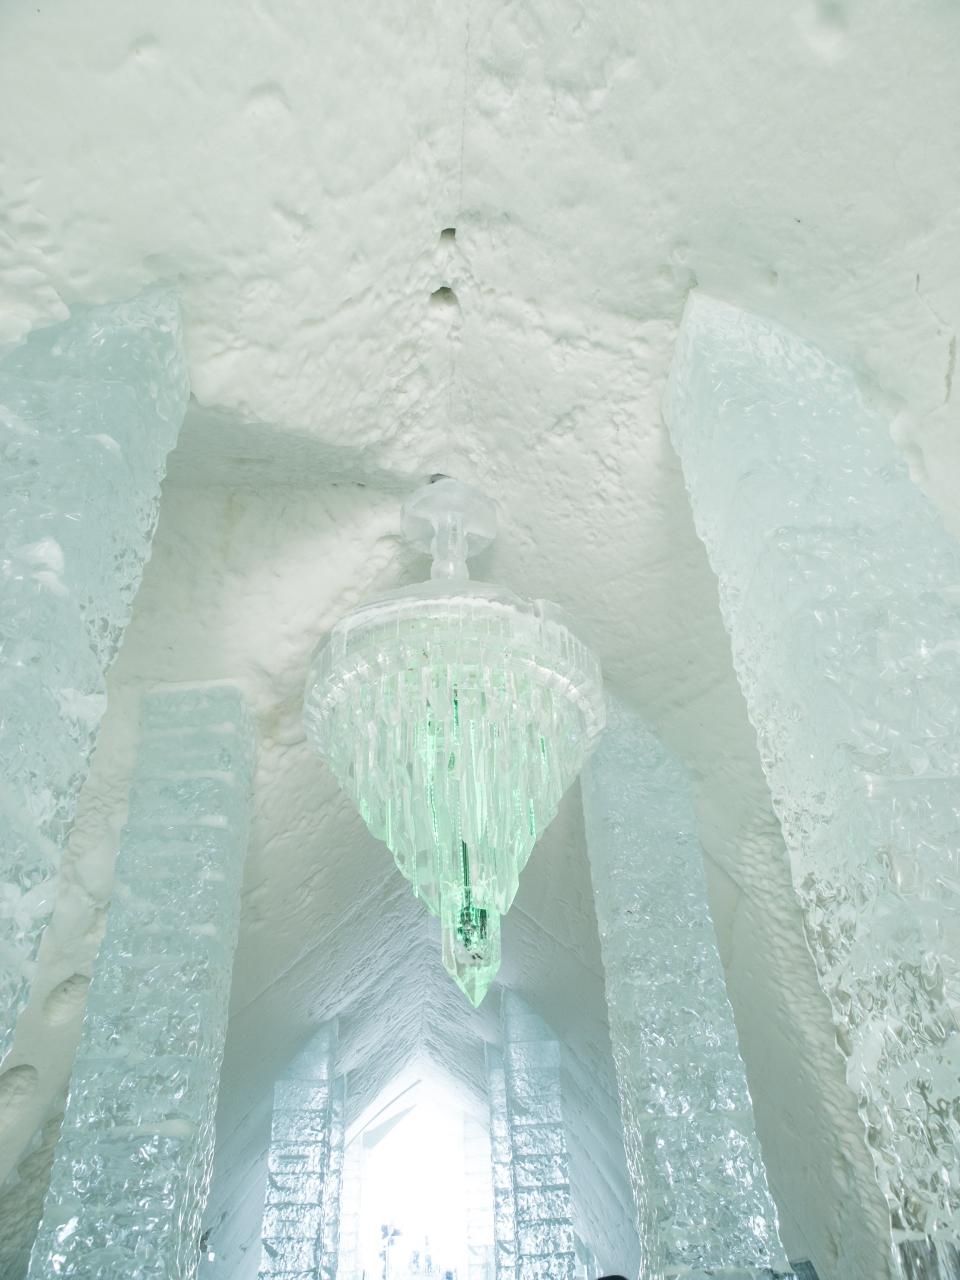 Boda invernal en un hotel de hielo